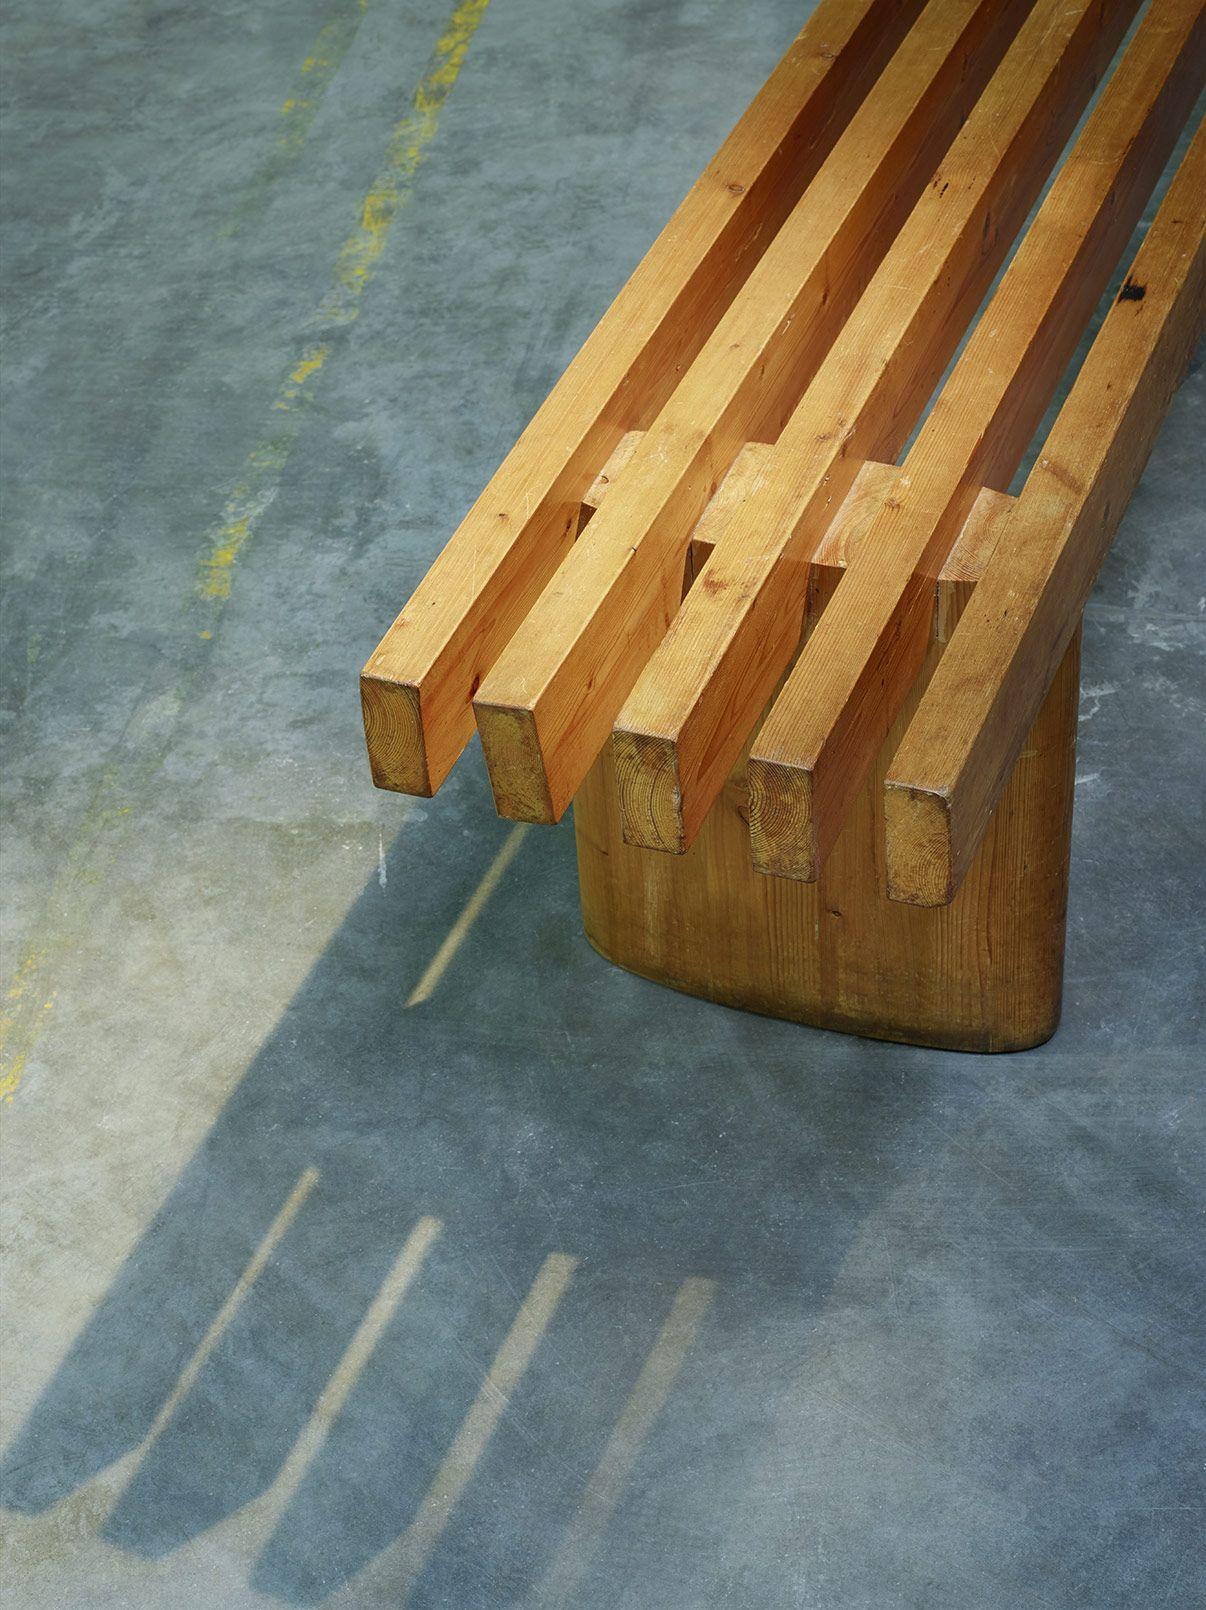 charlotte perriand banc mobilier pinterest terrasse charlotte perriand et plein air. Black Bedroom Furniture Sets. Home Design Ideas